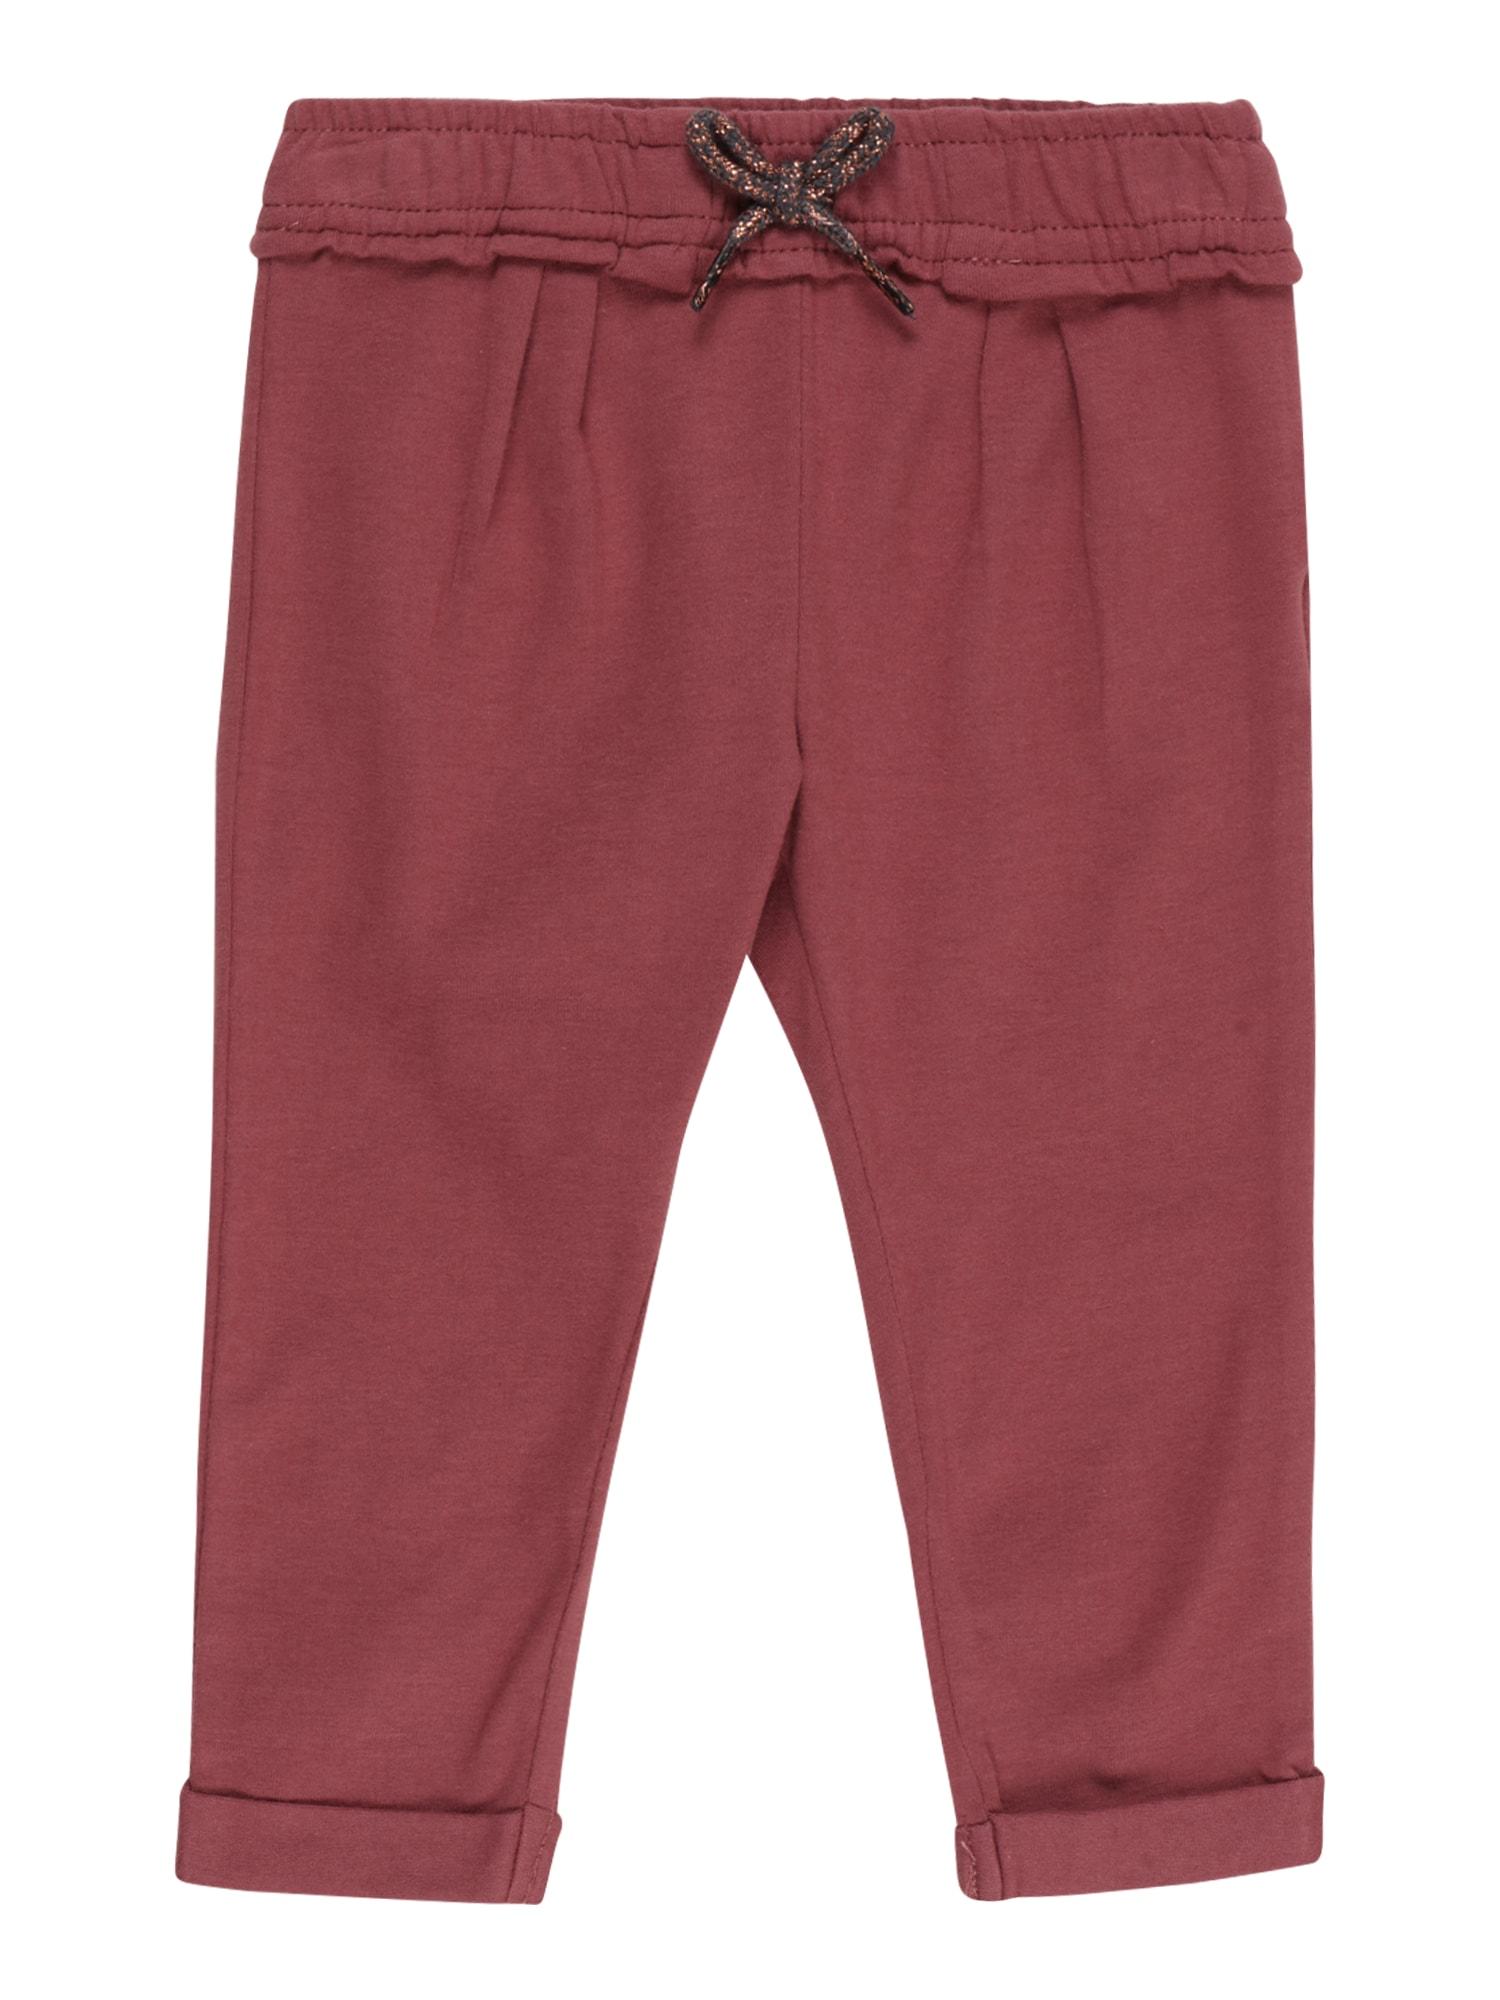 Noppies Kalhoty 'Santa Cruz'  tmavě červená